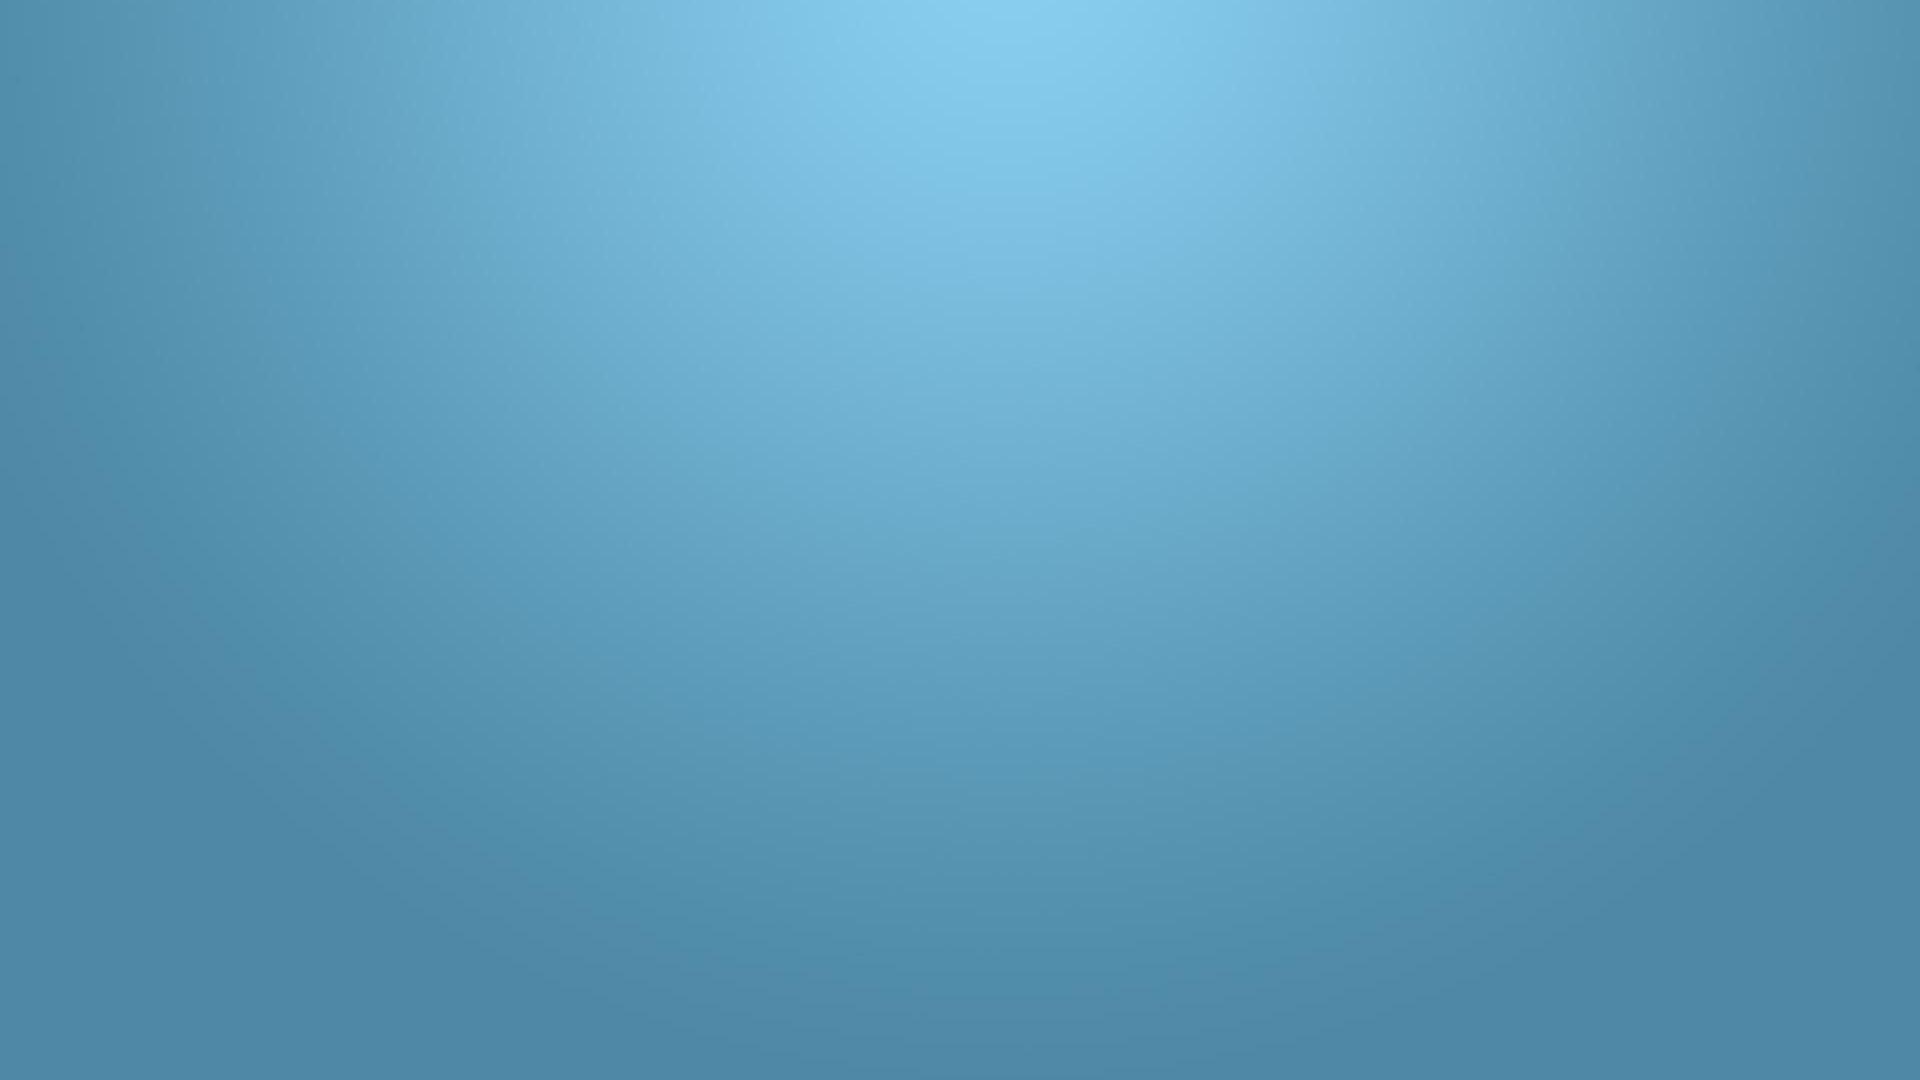 Solid Color Wallpaper 21965 1920x1080 Px